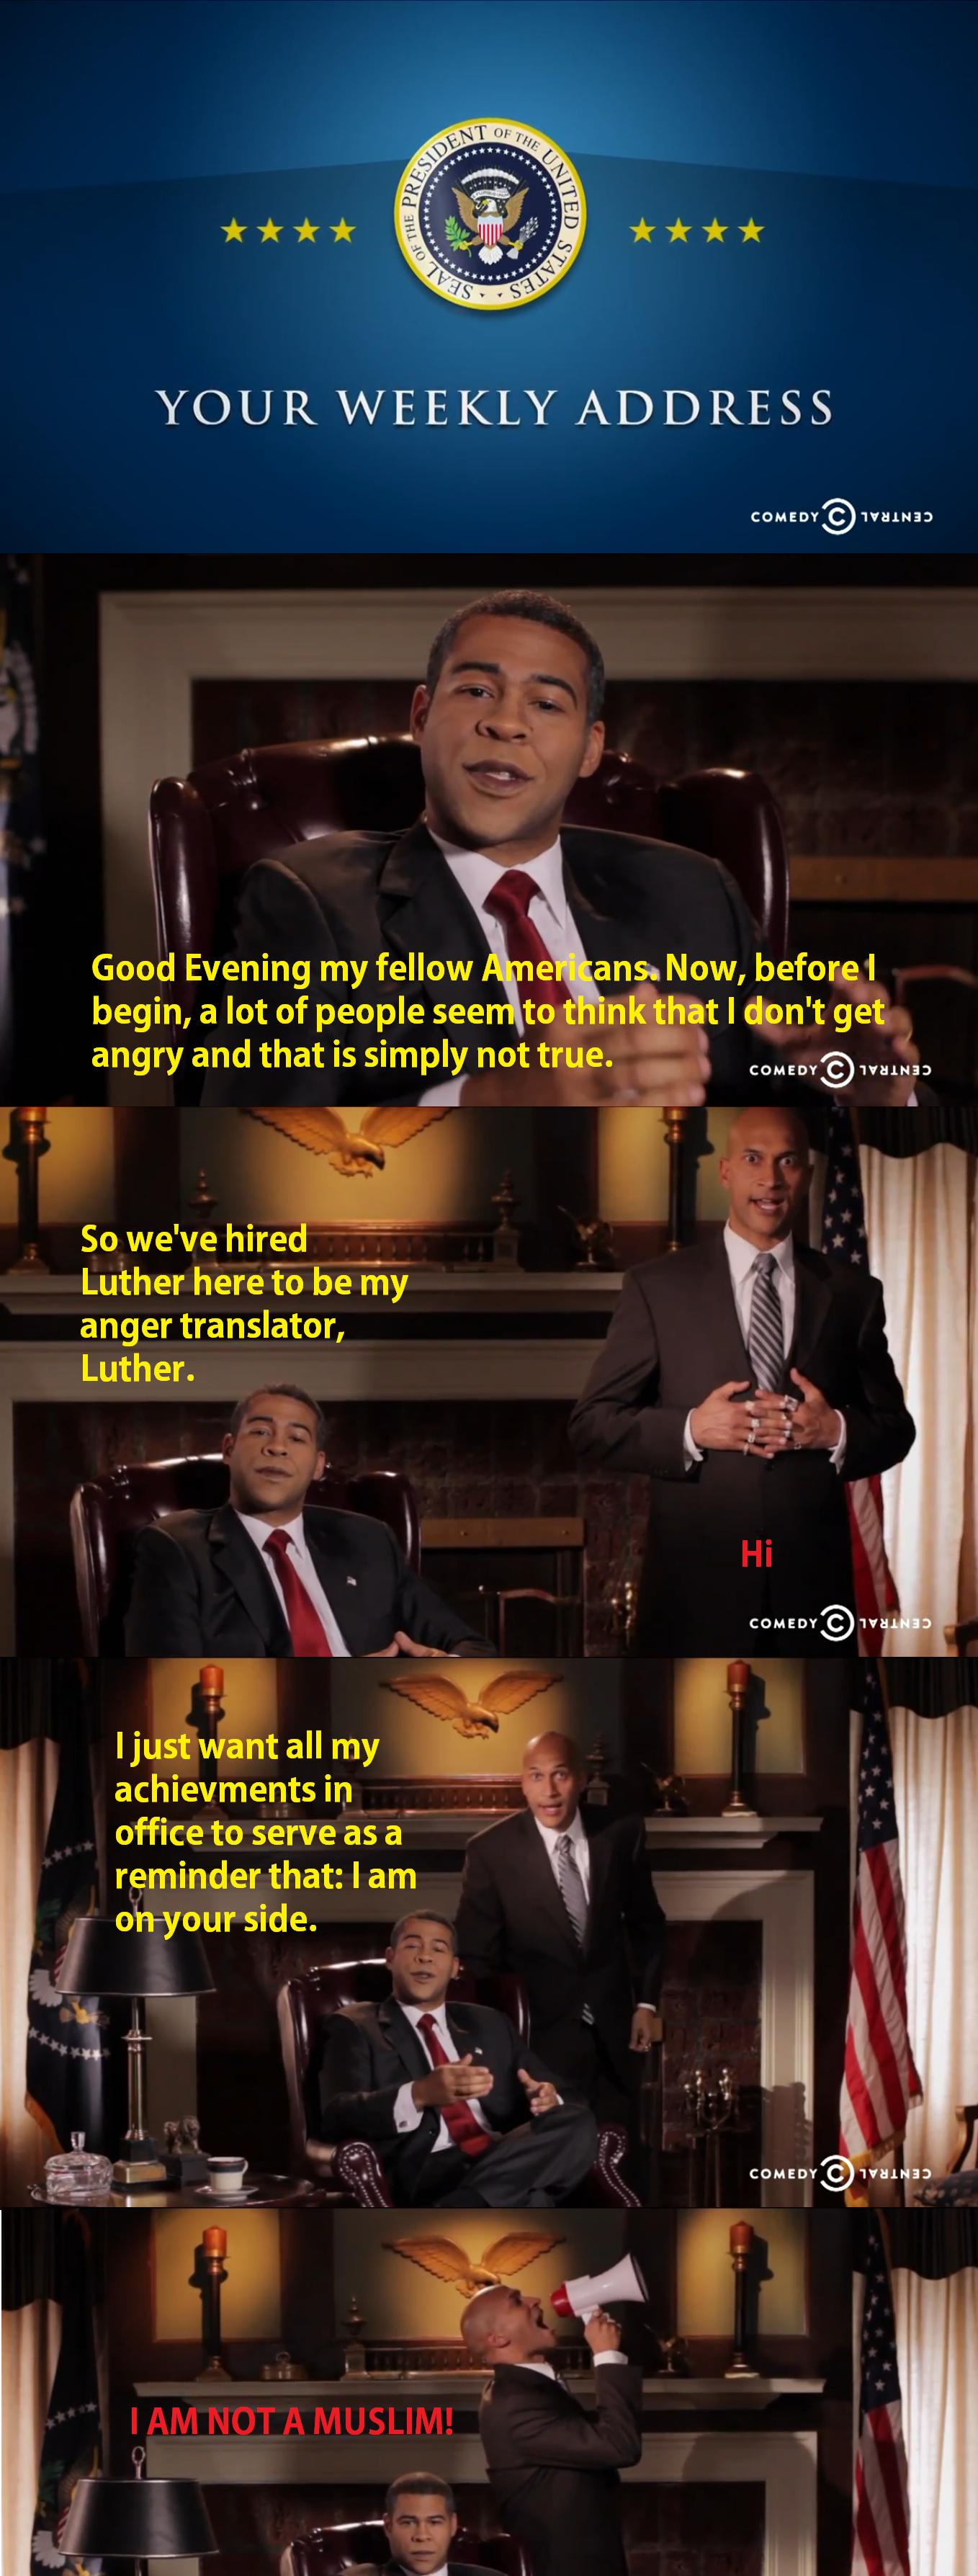 Obama loses his st. Key & Peele.